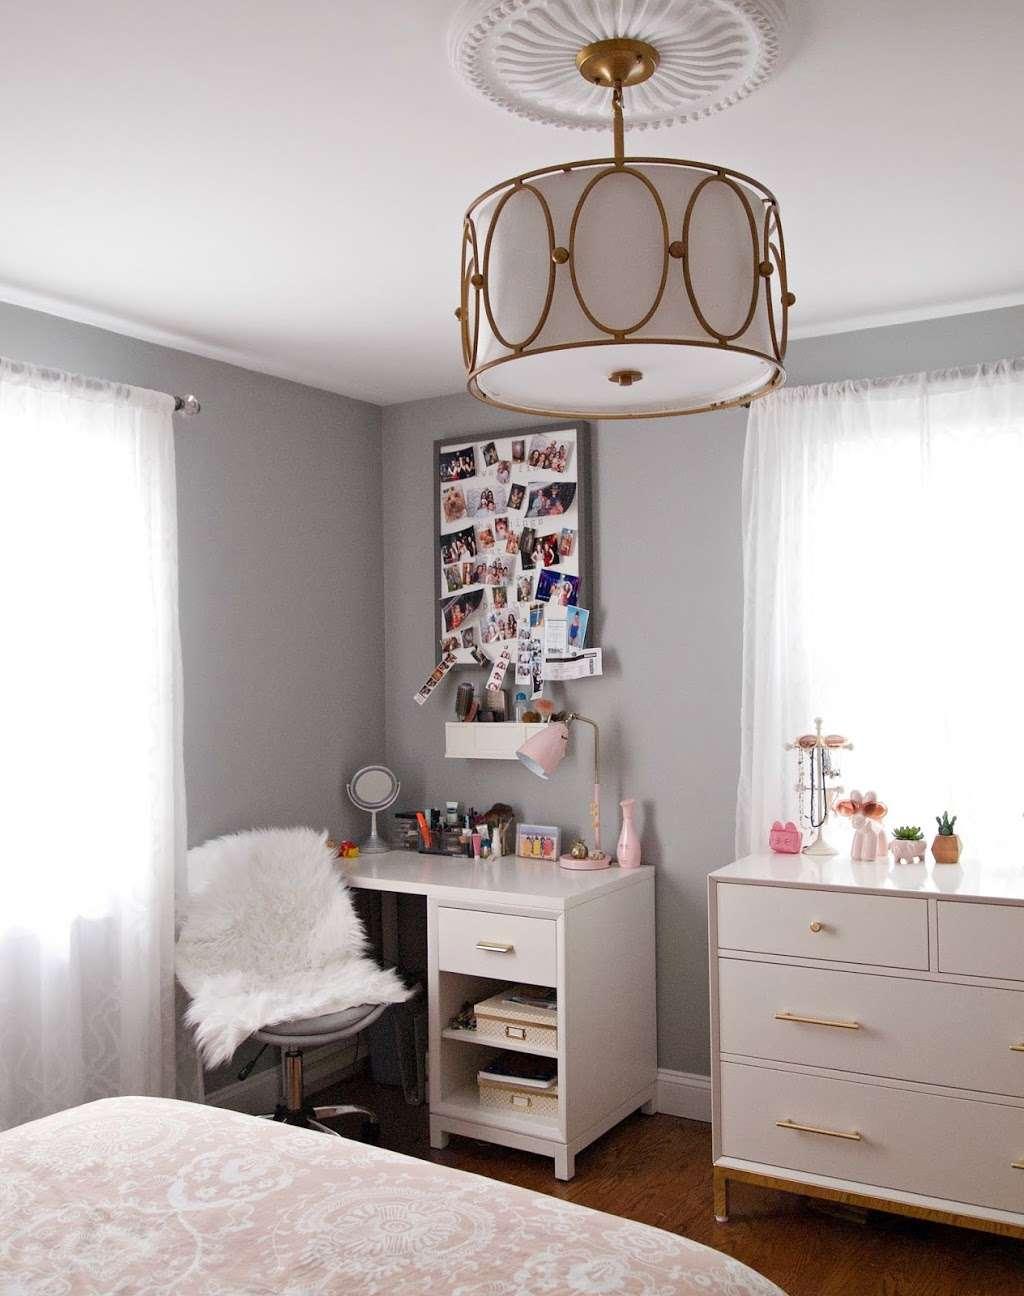 LoveYourRoom - home goods store  | Photo 6 of 10 | Address: 4709 Glenwood Cir, Emmaus, PA 18049, USA | Phone: (610) 573-0642